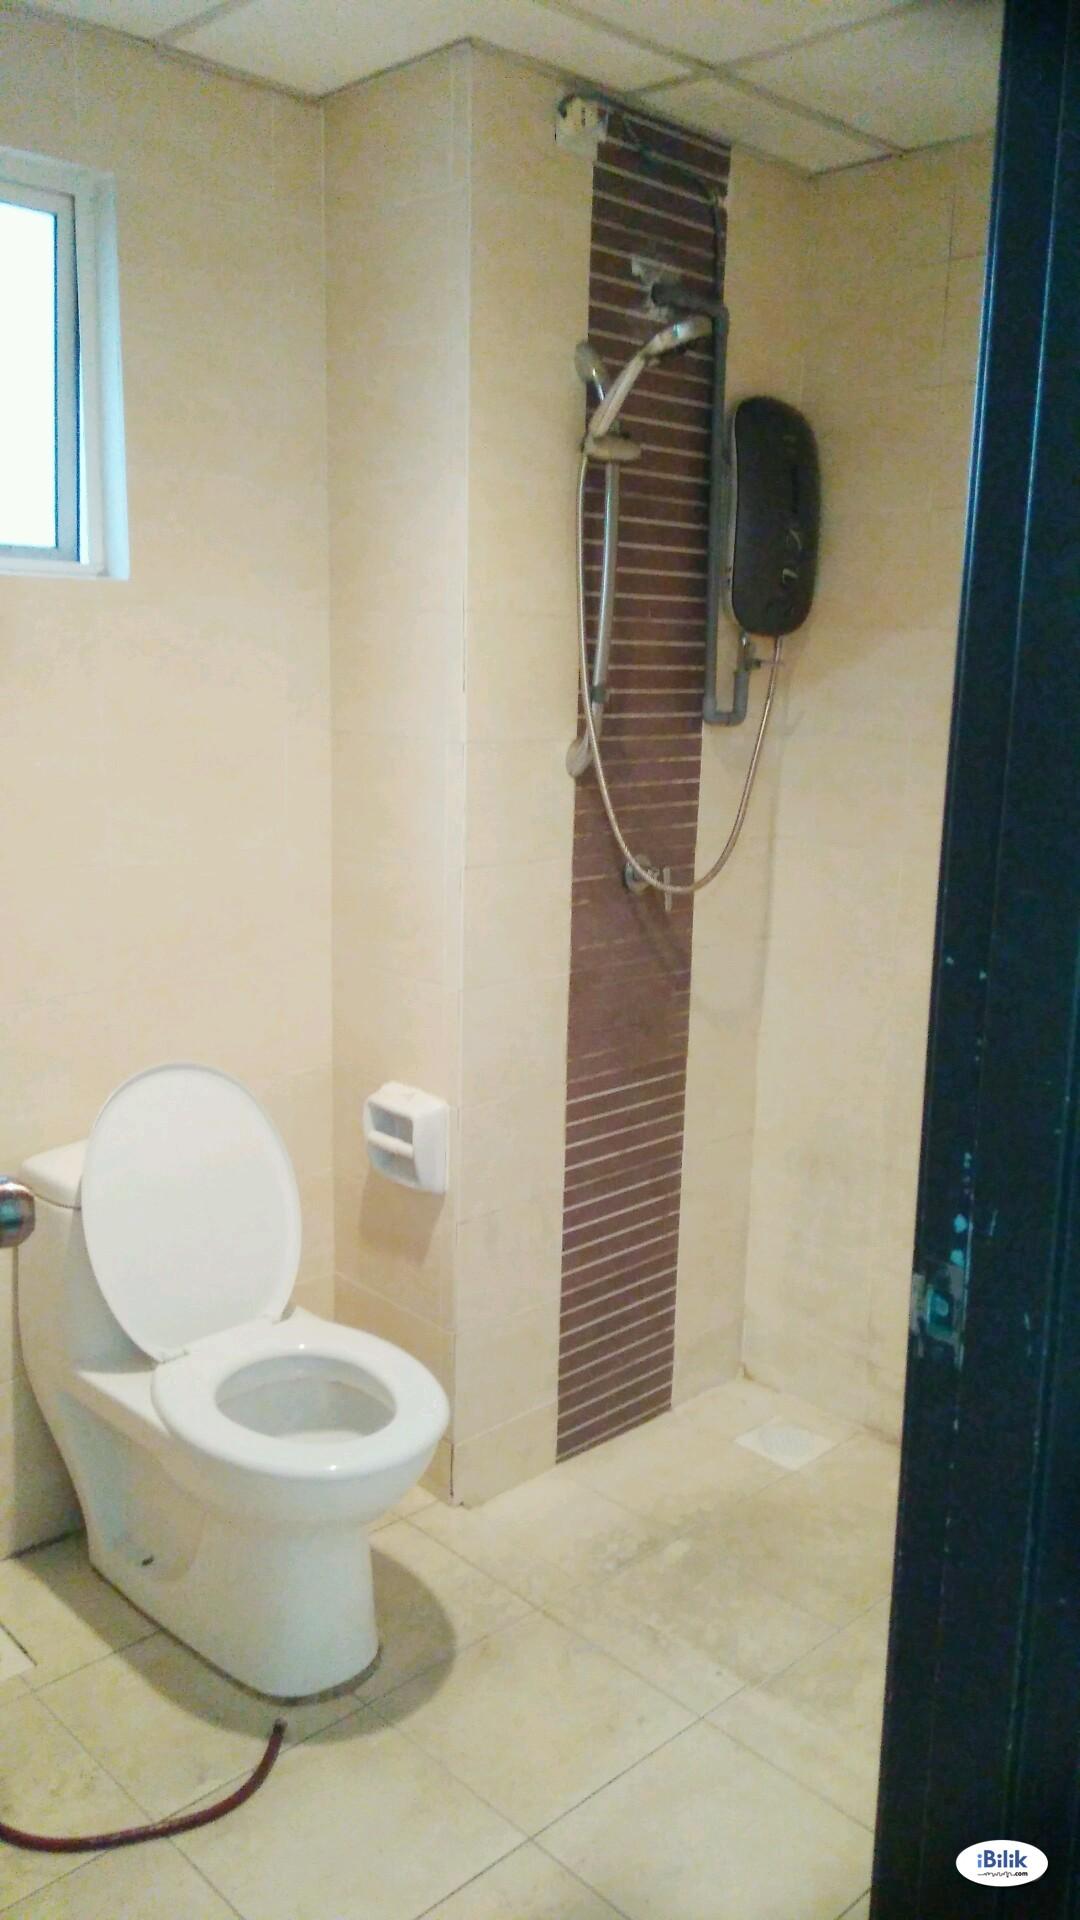 Male Middle Room at Cova Villa, Kota Damansara